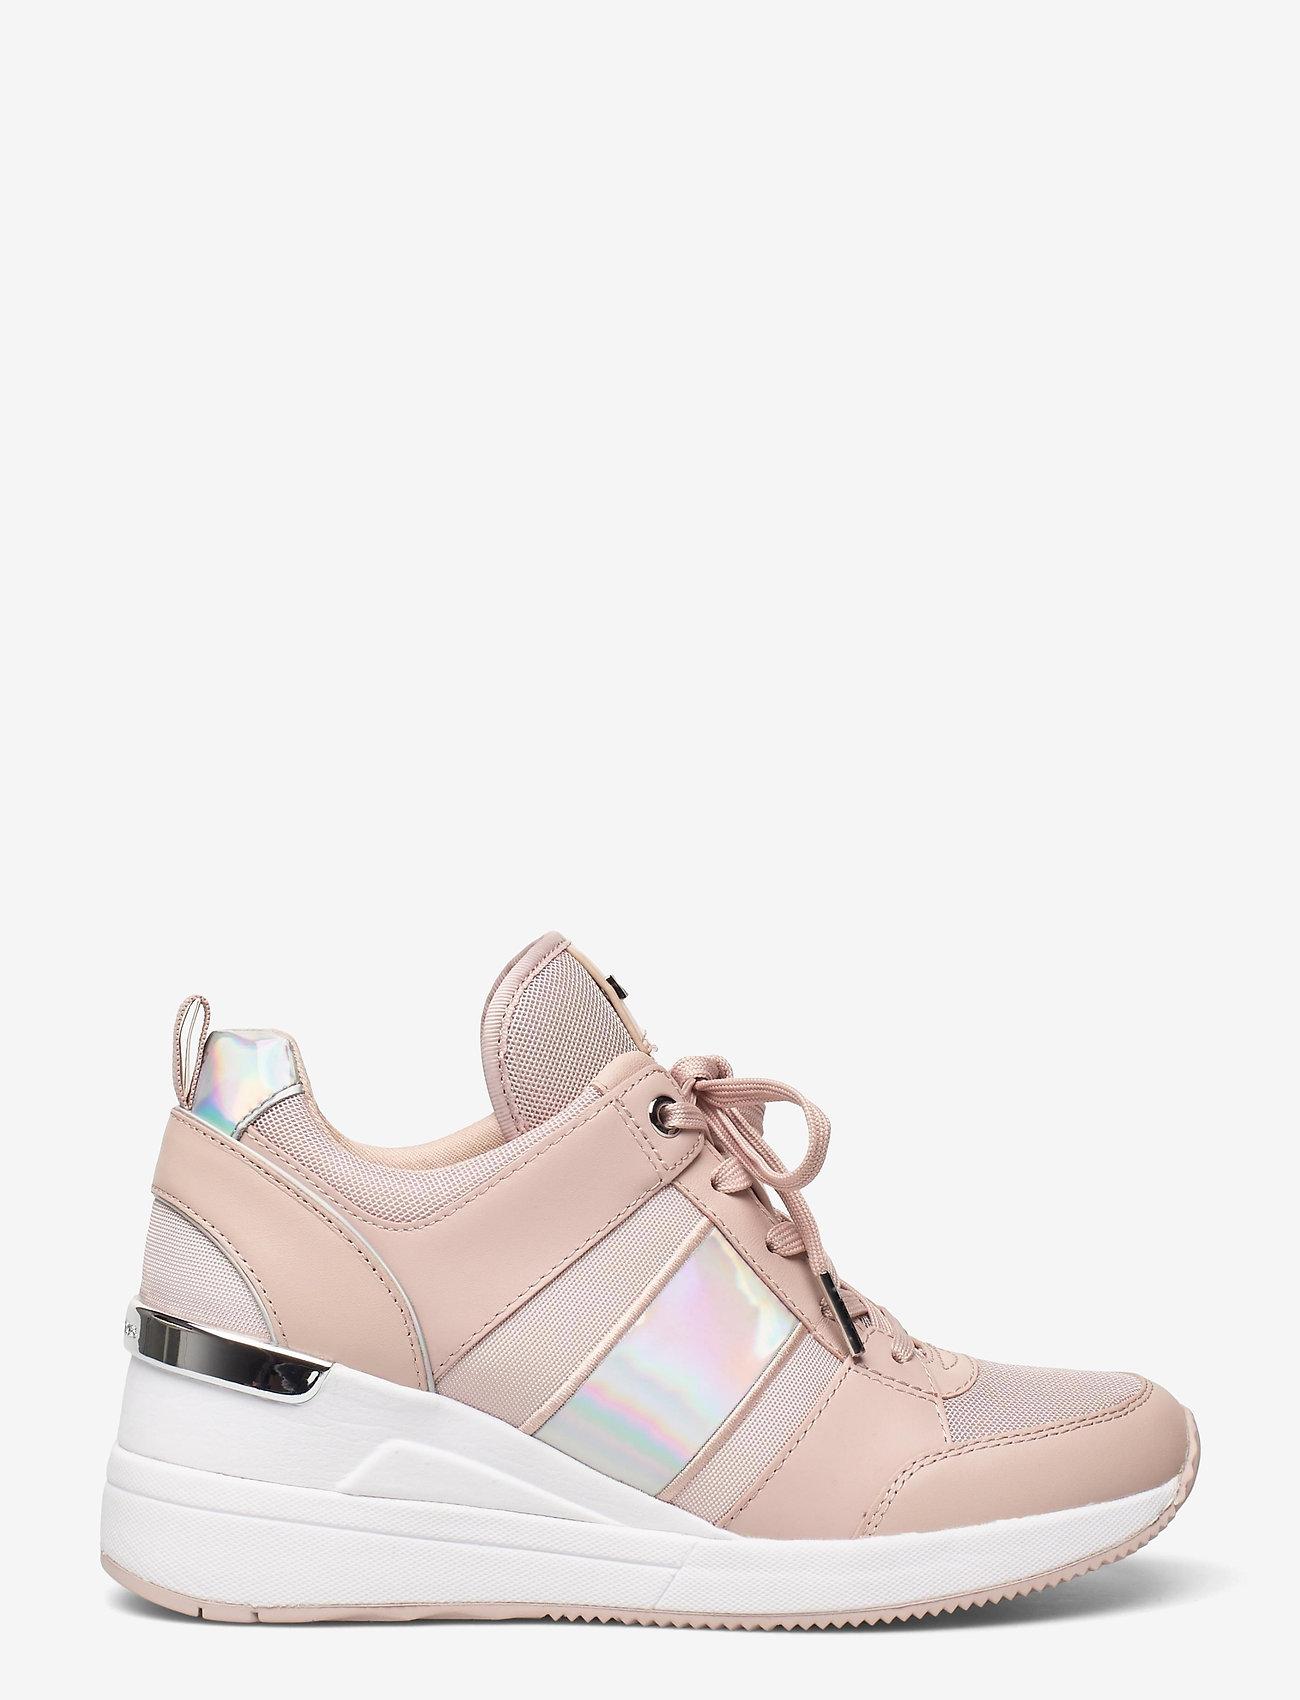 Michael Kors - GEORGIE TRAINER - chunky sneakers - soft pink - 1